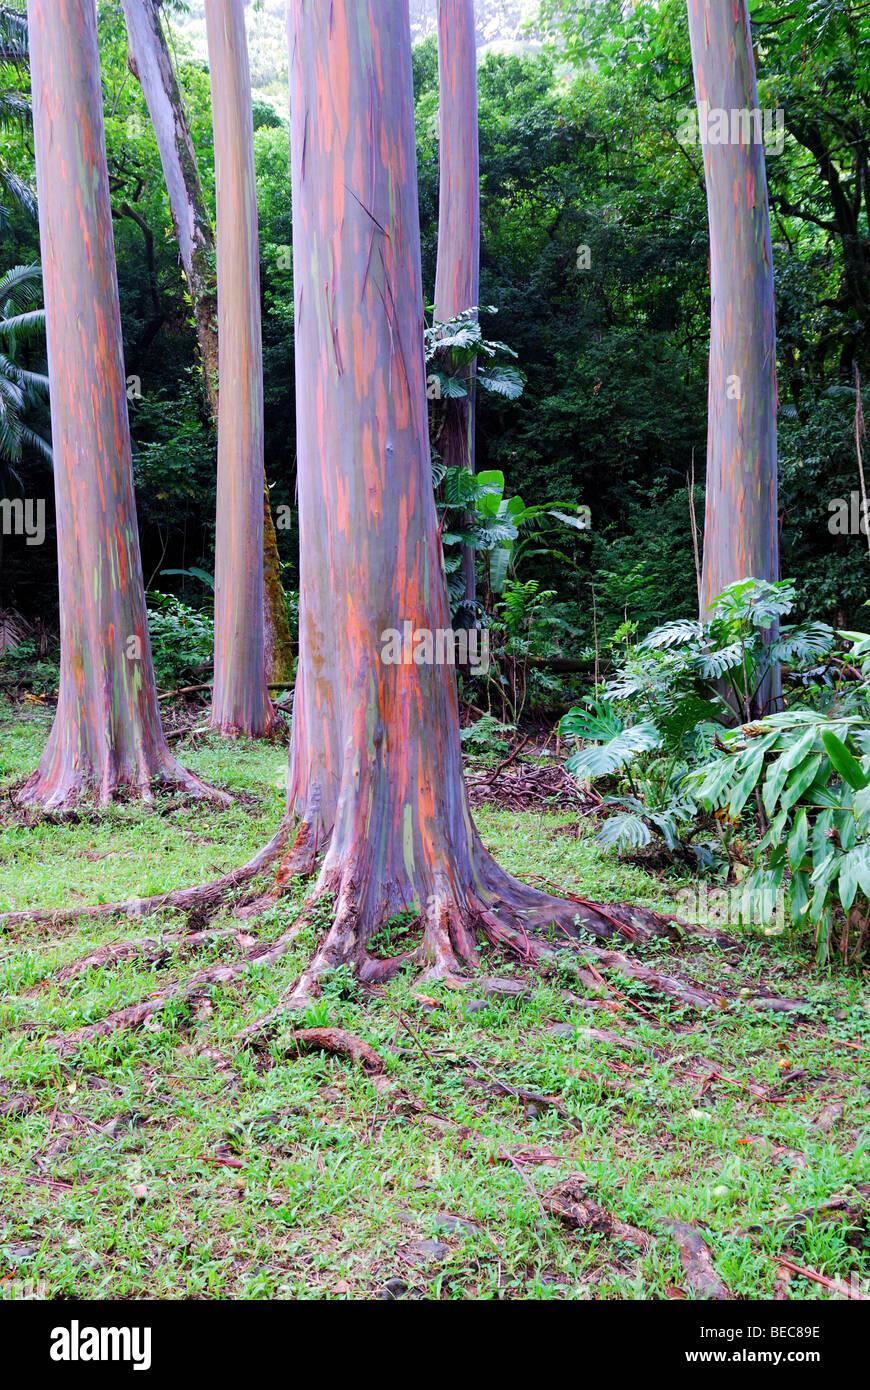 Colorful Eucalyptus tree trunks in Keahua arboretum, Maui, Hawaii - Stock Image